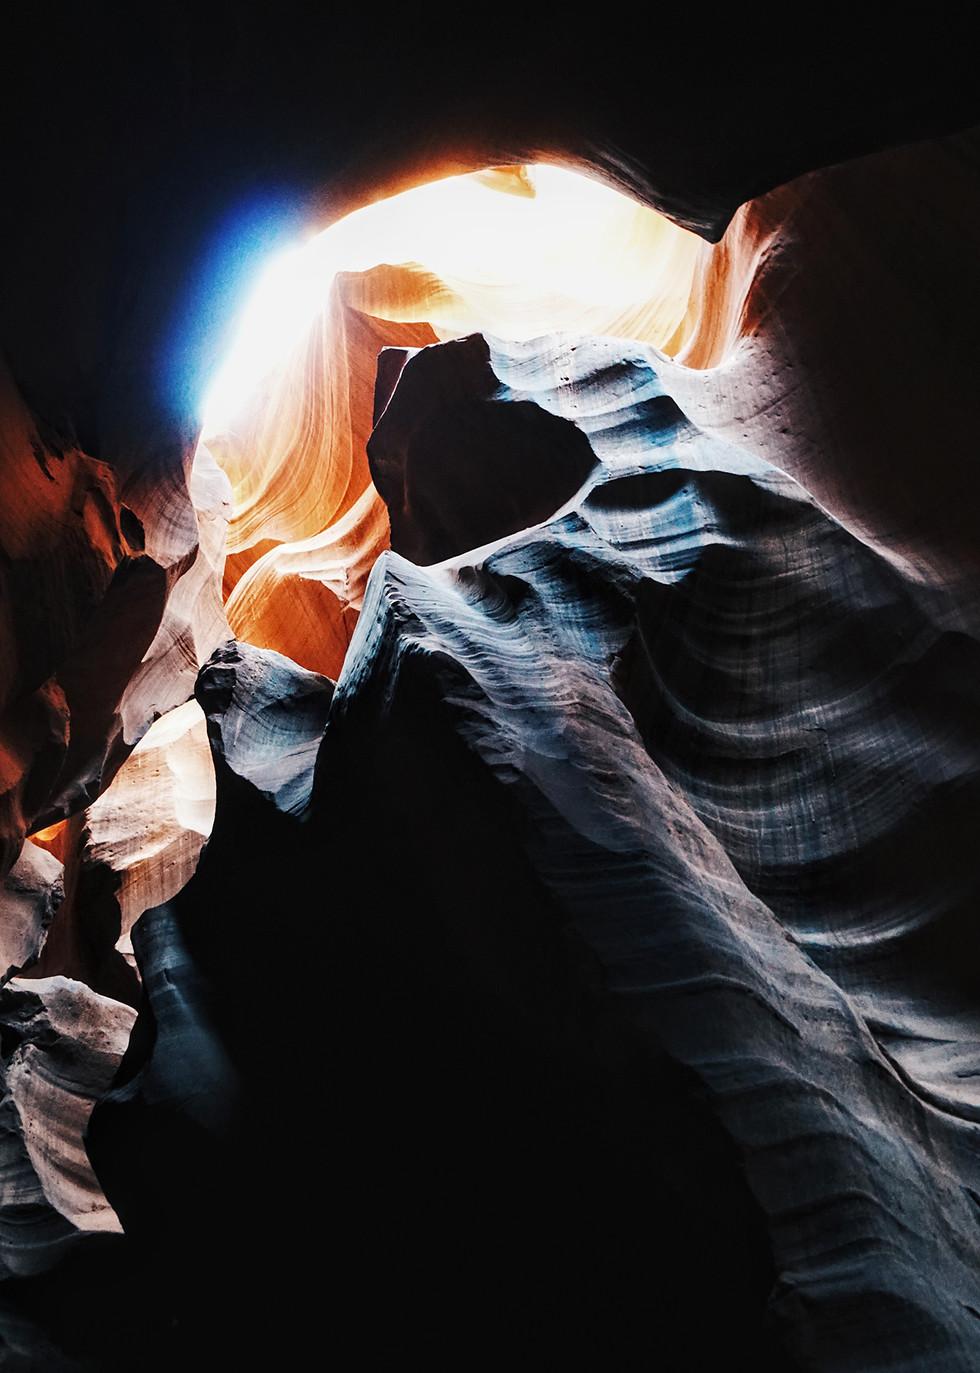 America-National-Park-Antelope-Canyon-Be